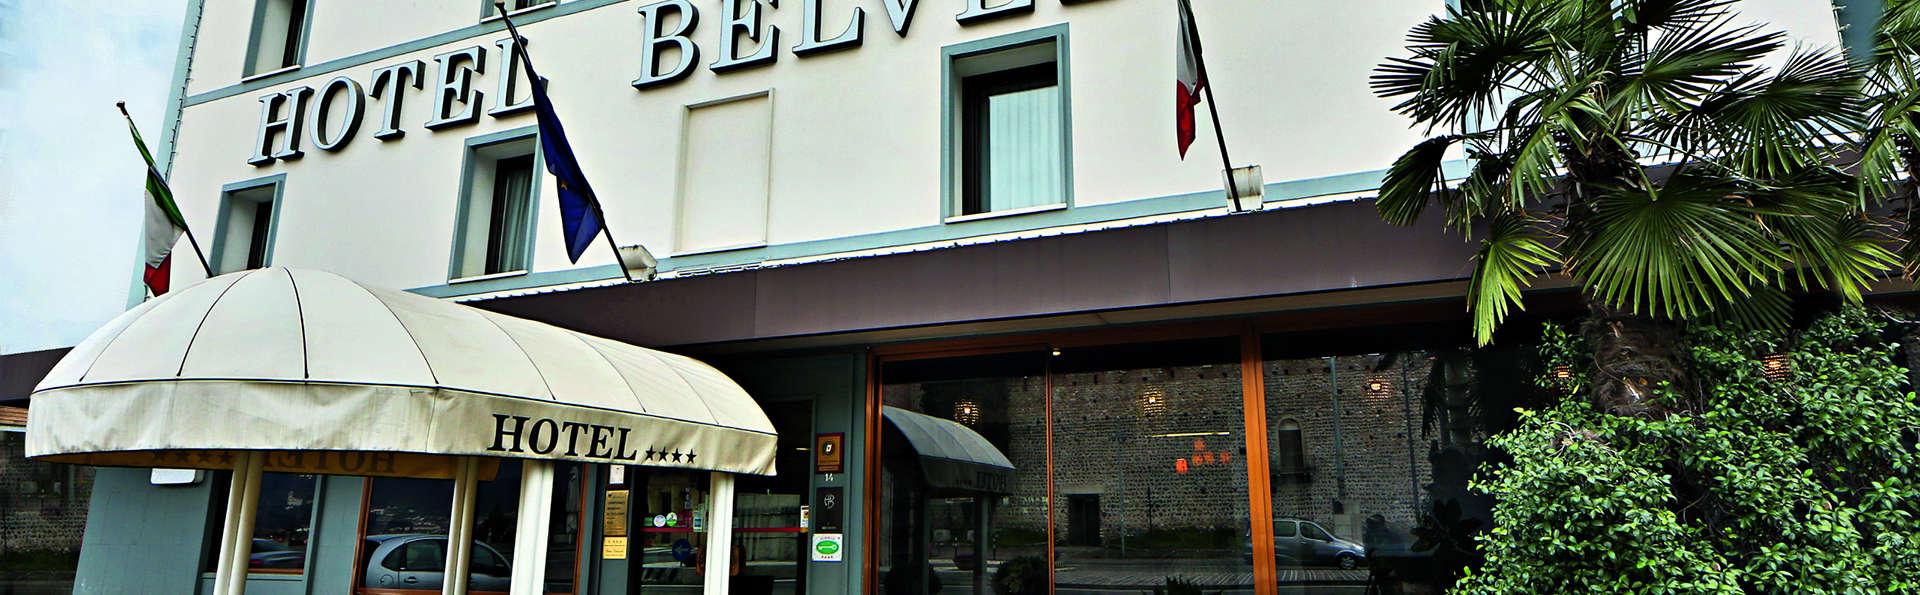 Bonotto Hotel Belvedere - Edit_Front3.jpg